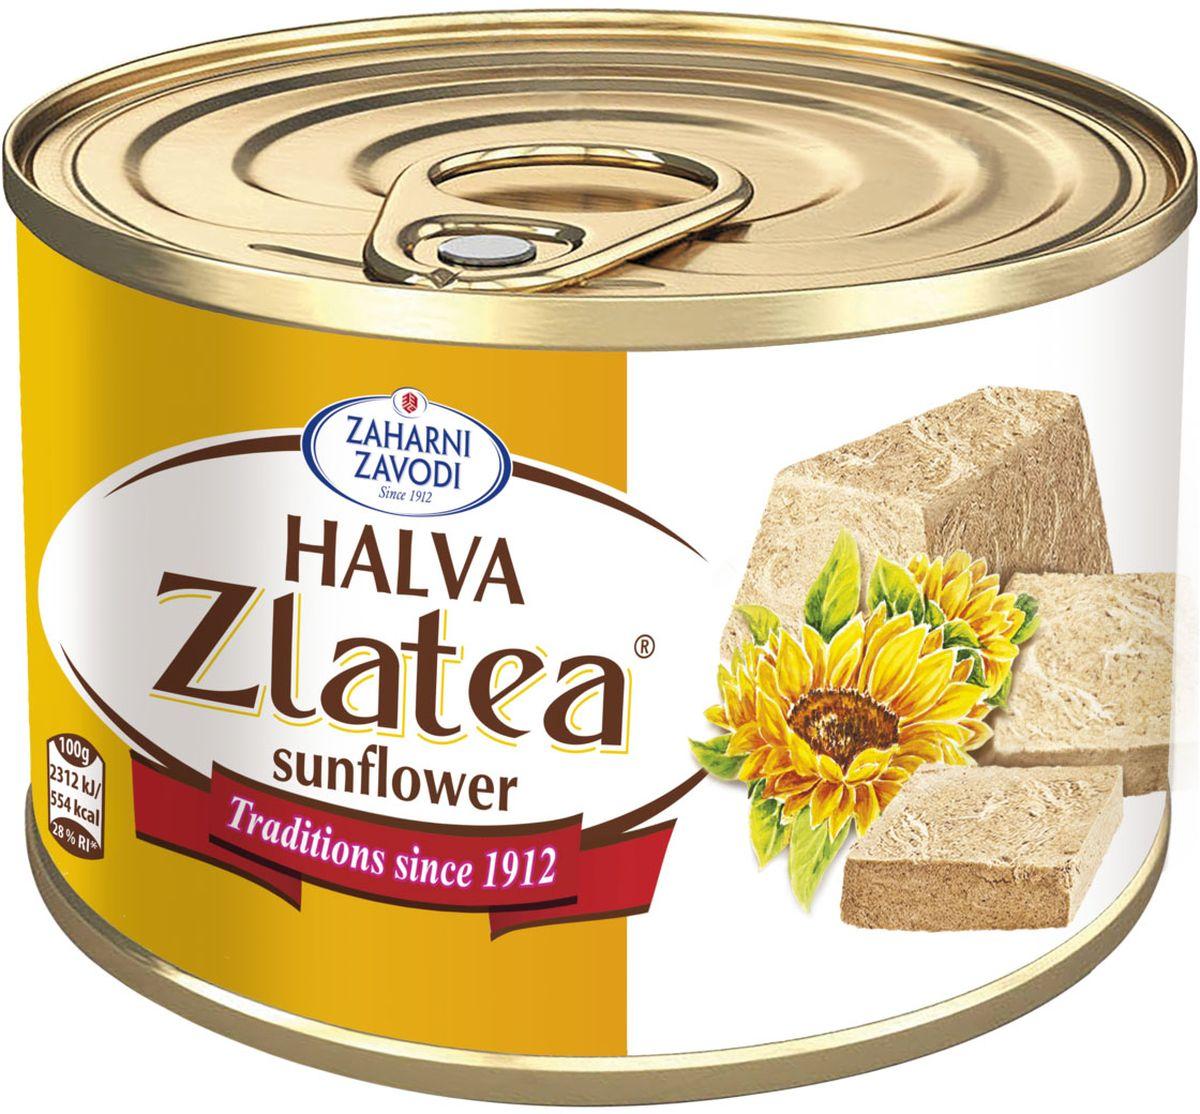 Zaharni Zavodi Zlatea Подсолнечная халва, 420 г мааг халва подсолнечника 200 г